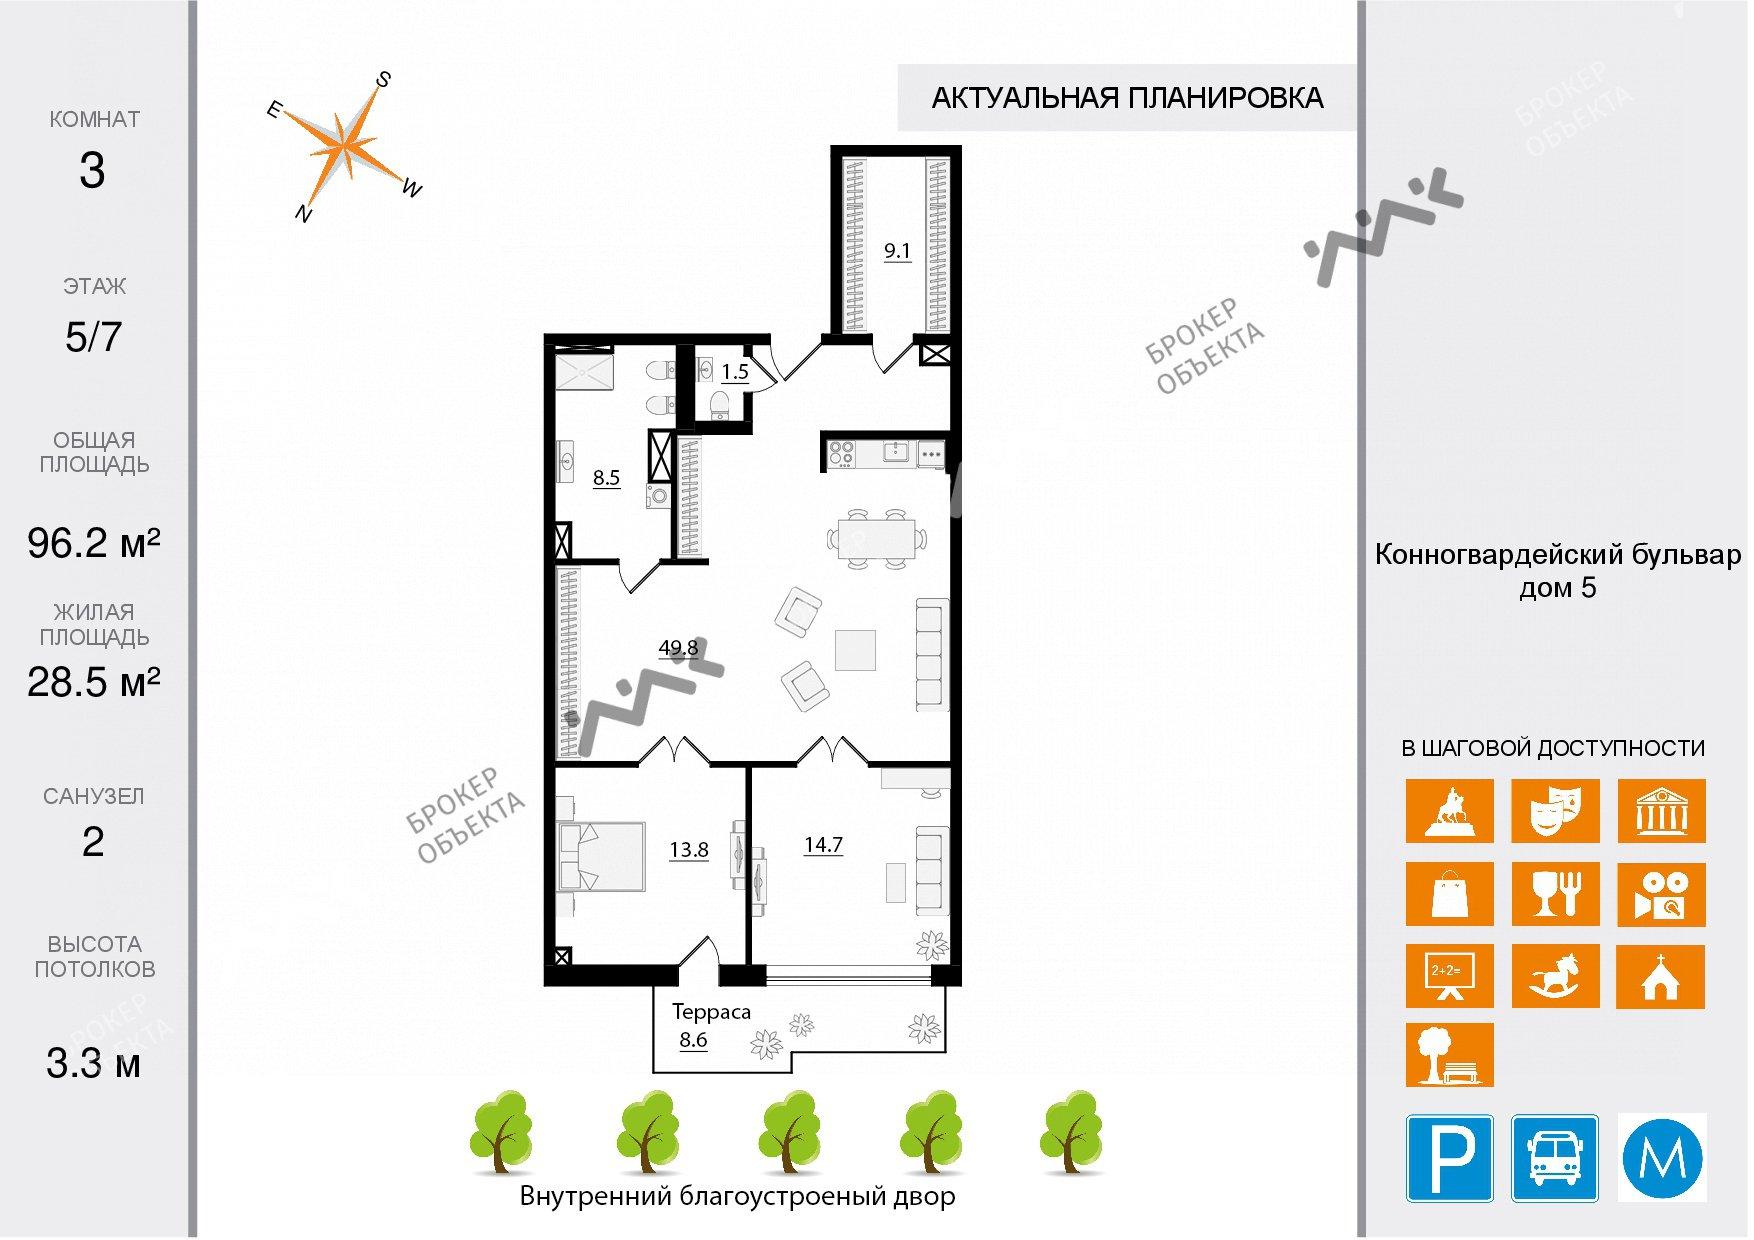 Планировка Конногвардейский бул., д.5. Лот № 21845804